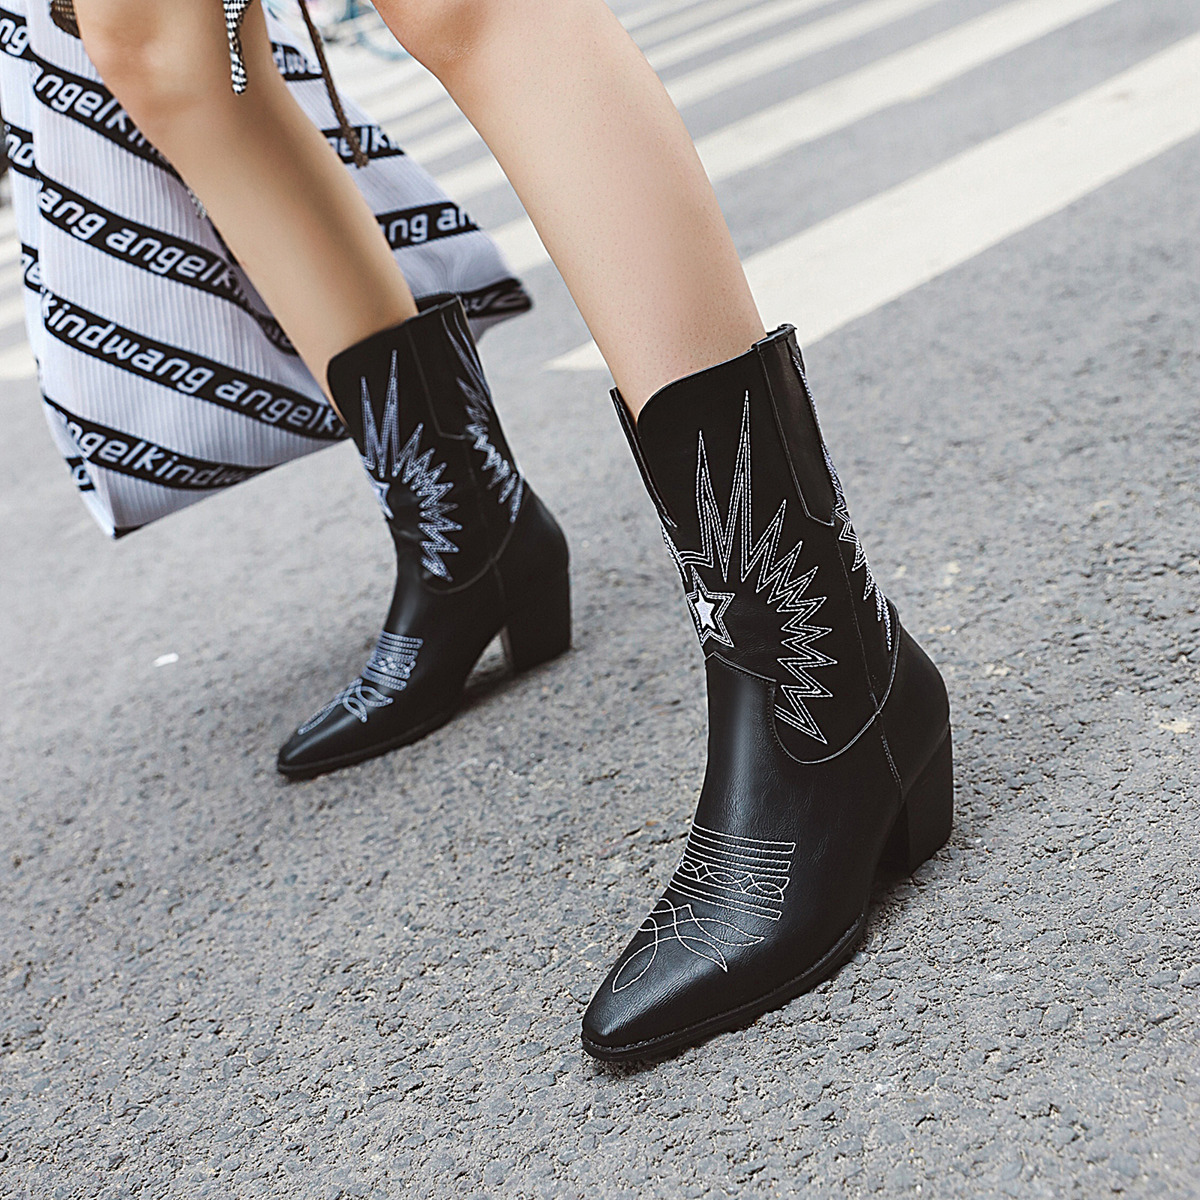 Winter Shoes|Mid-Calf Boots| - AliExpress